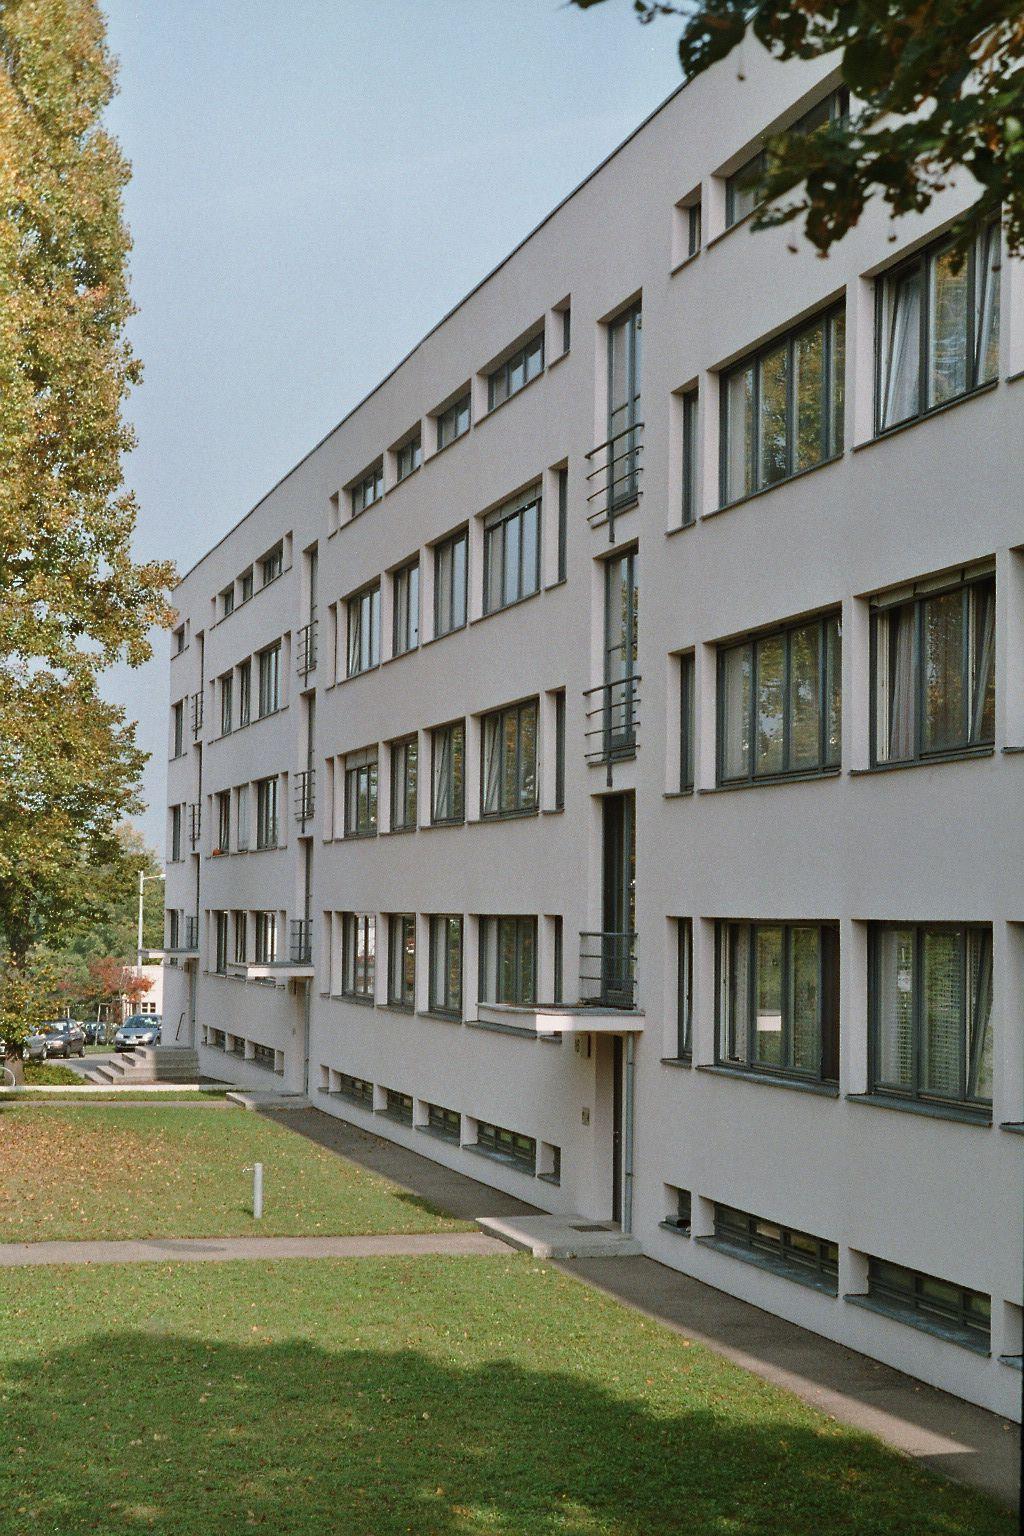 Weissenhof Siedlung Stuttgart Germany Am 14 20 Designed By Ludwig Mies Van Der Rohe